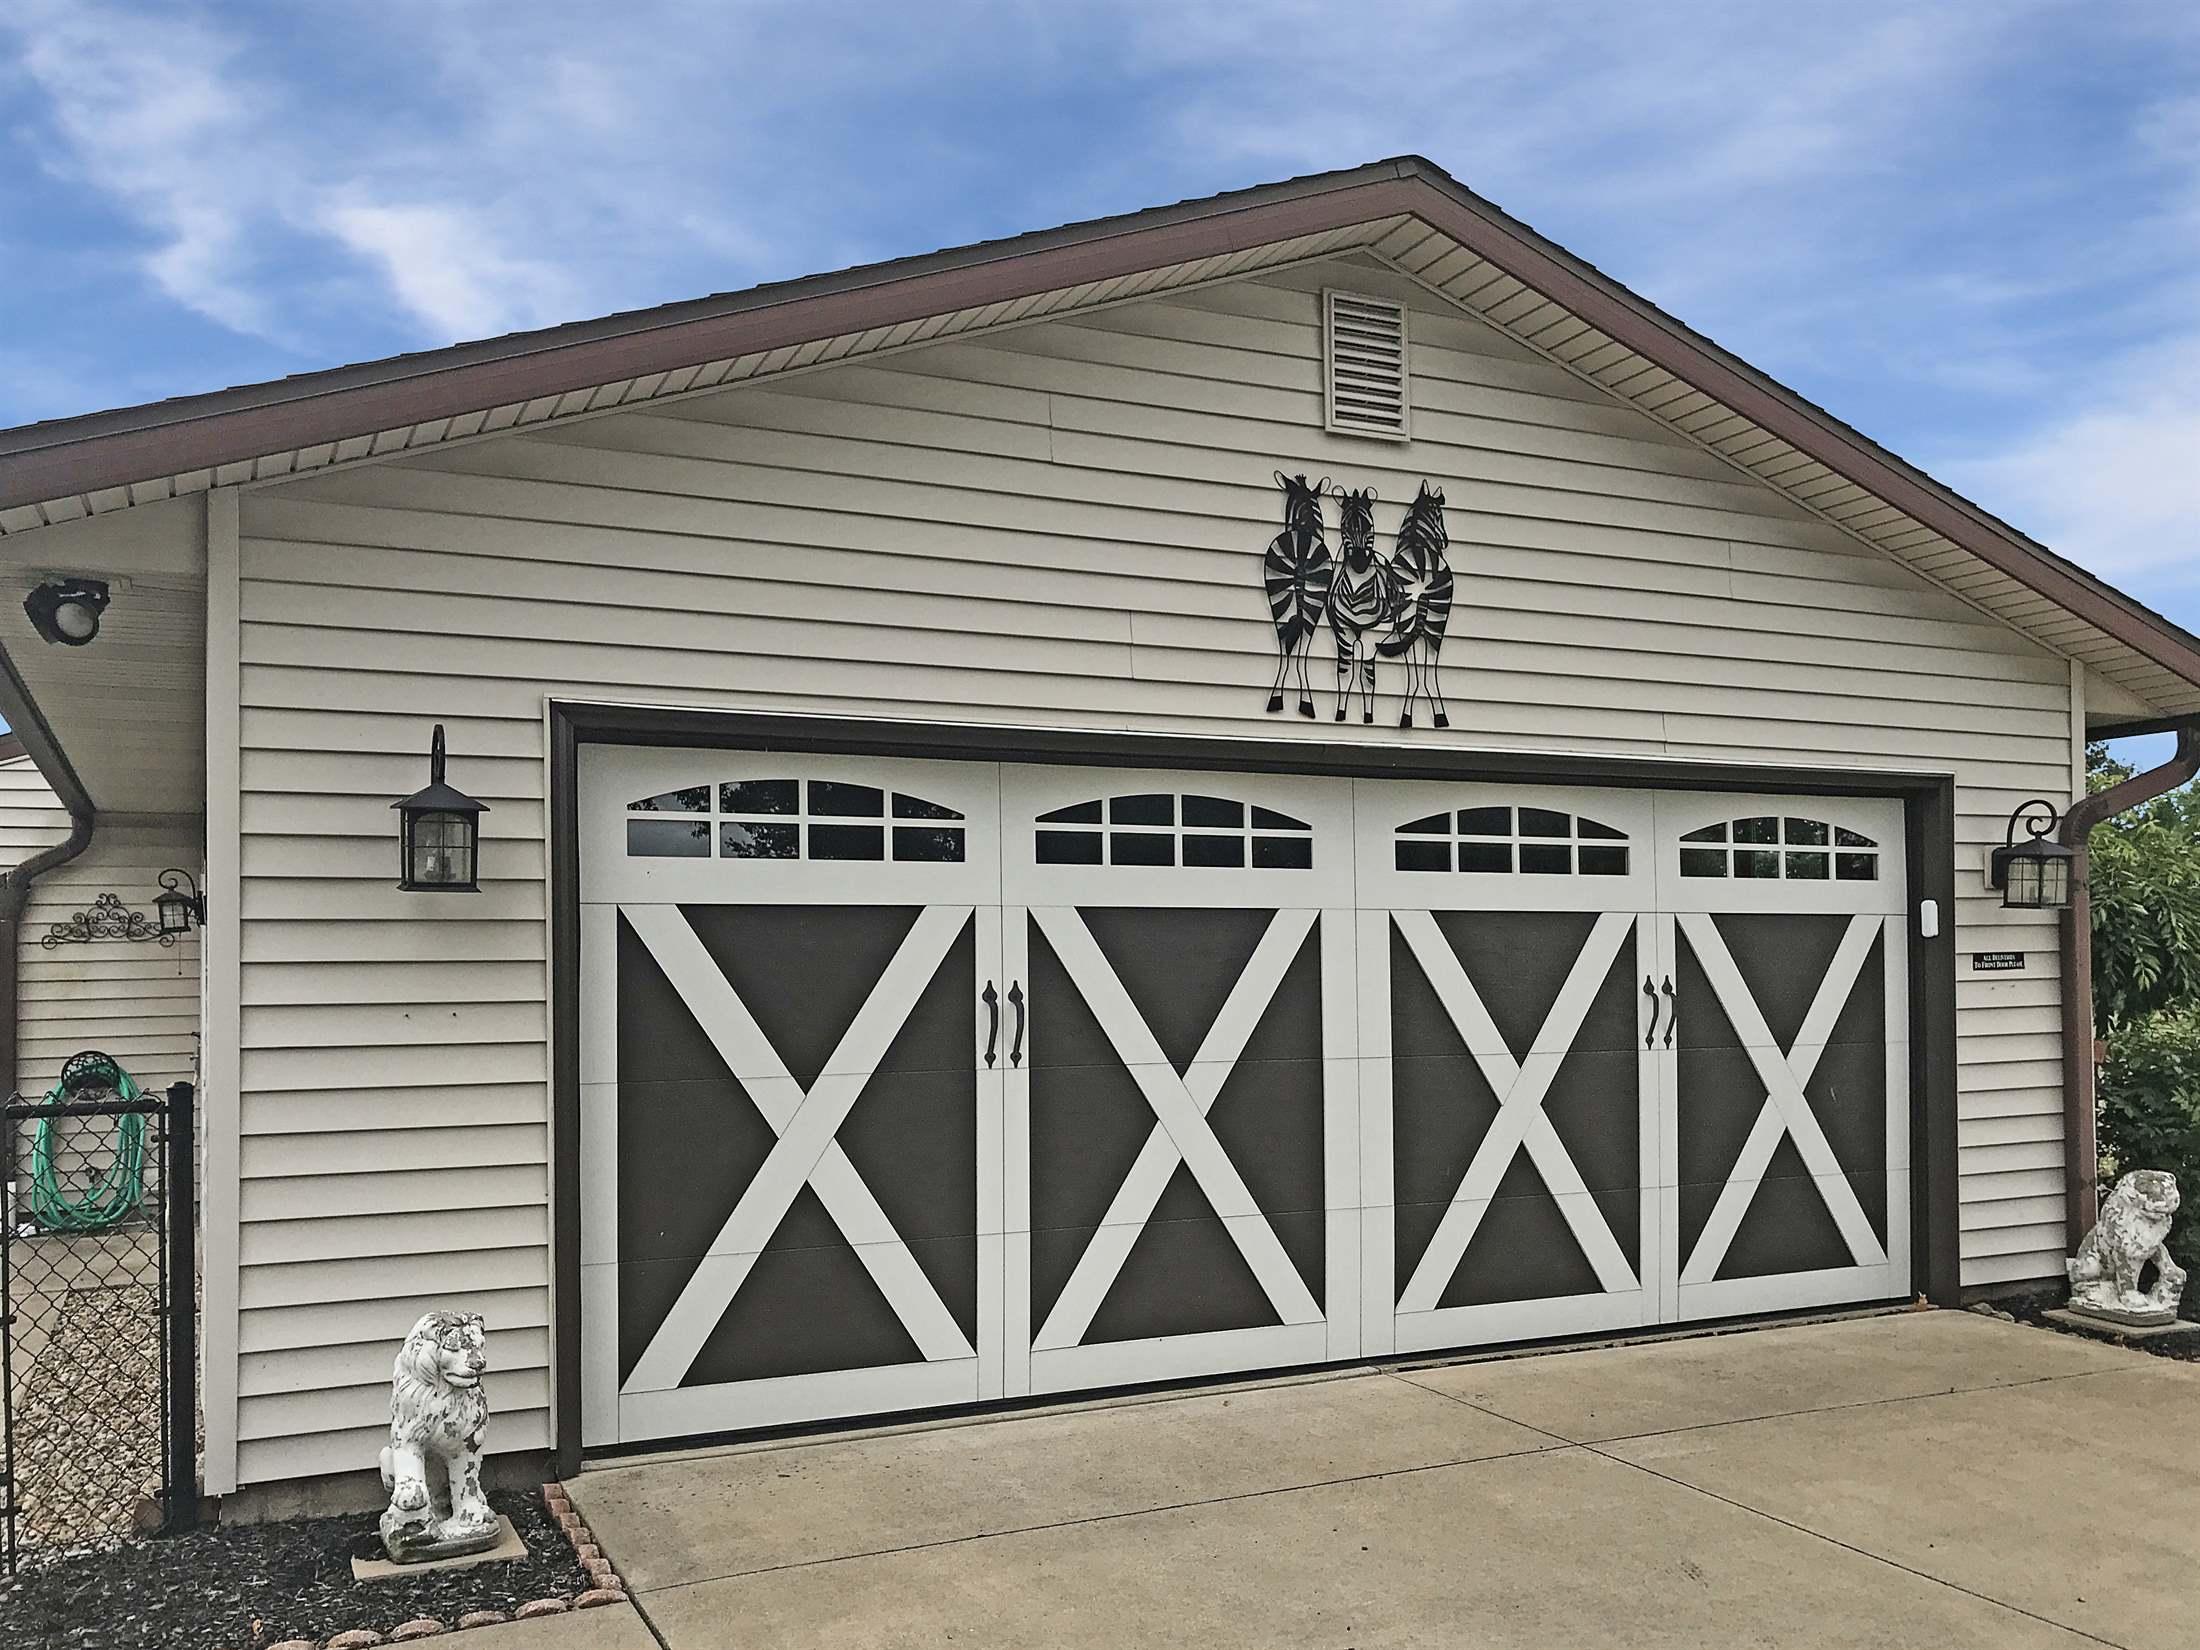 1049 Township Road 1682, Ashland, OH 44805